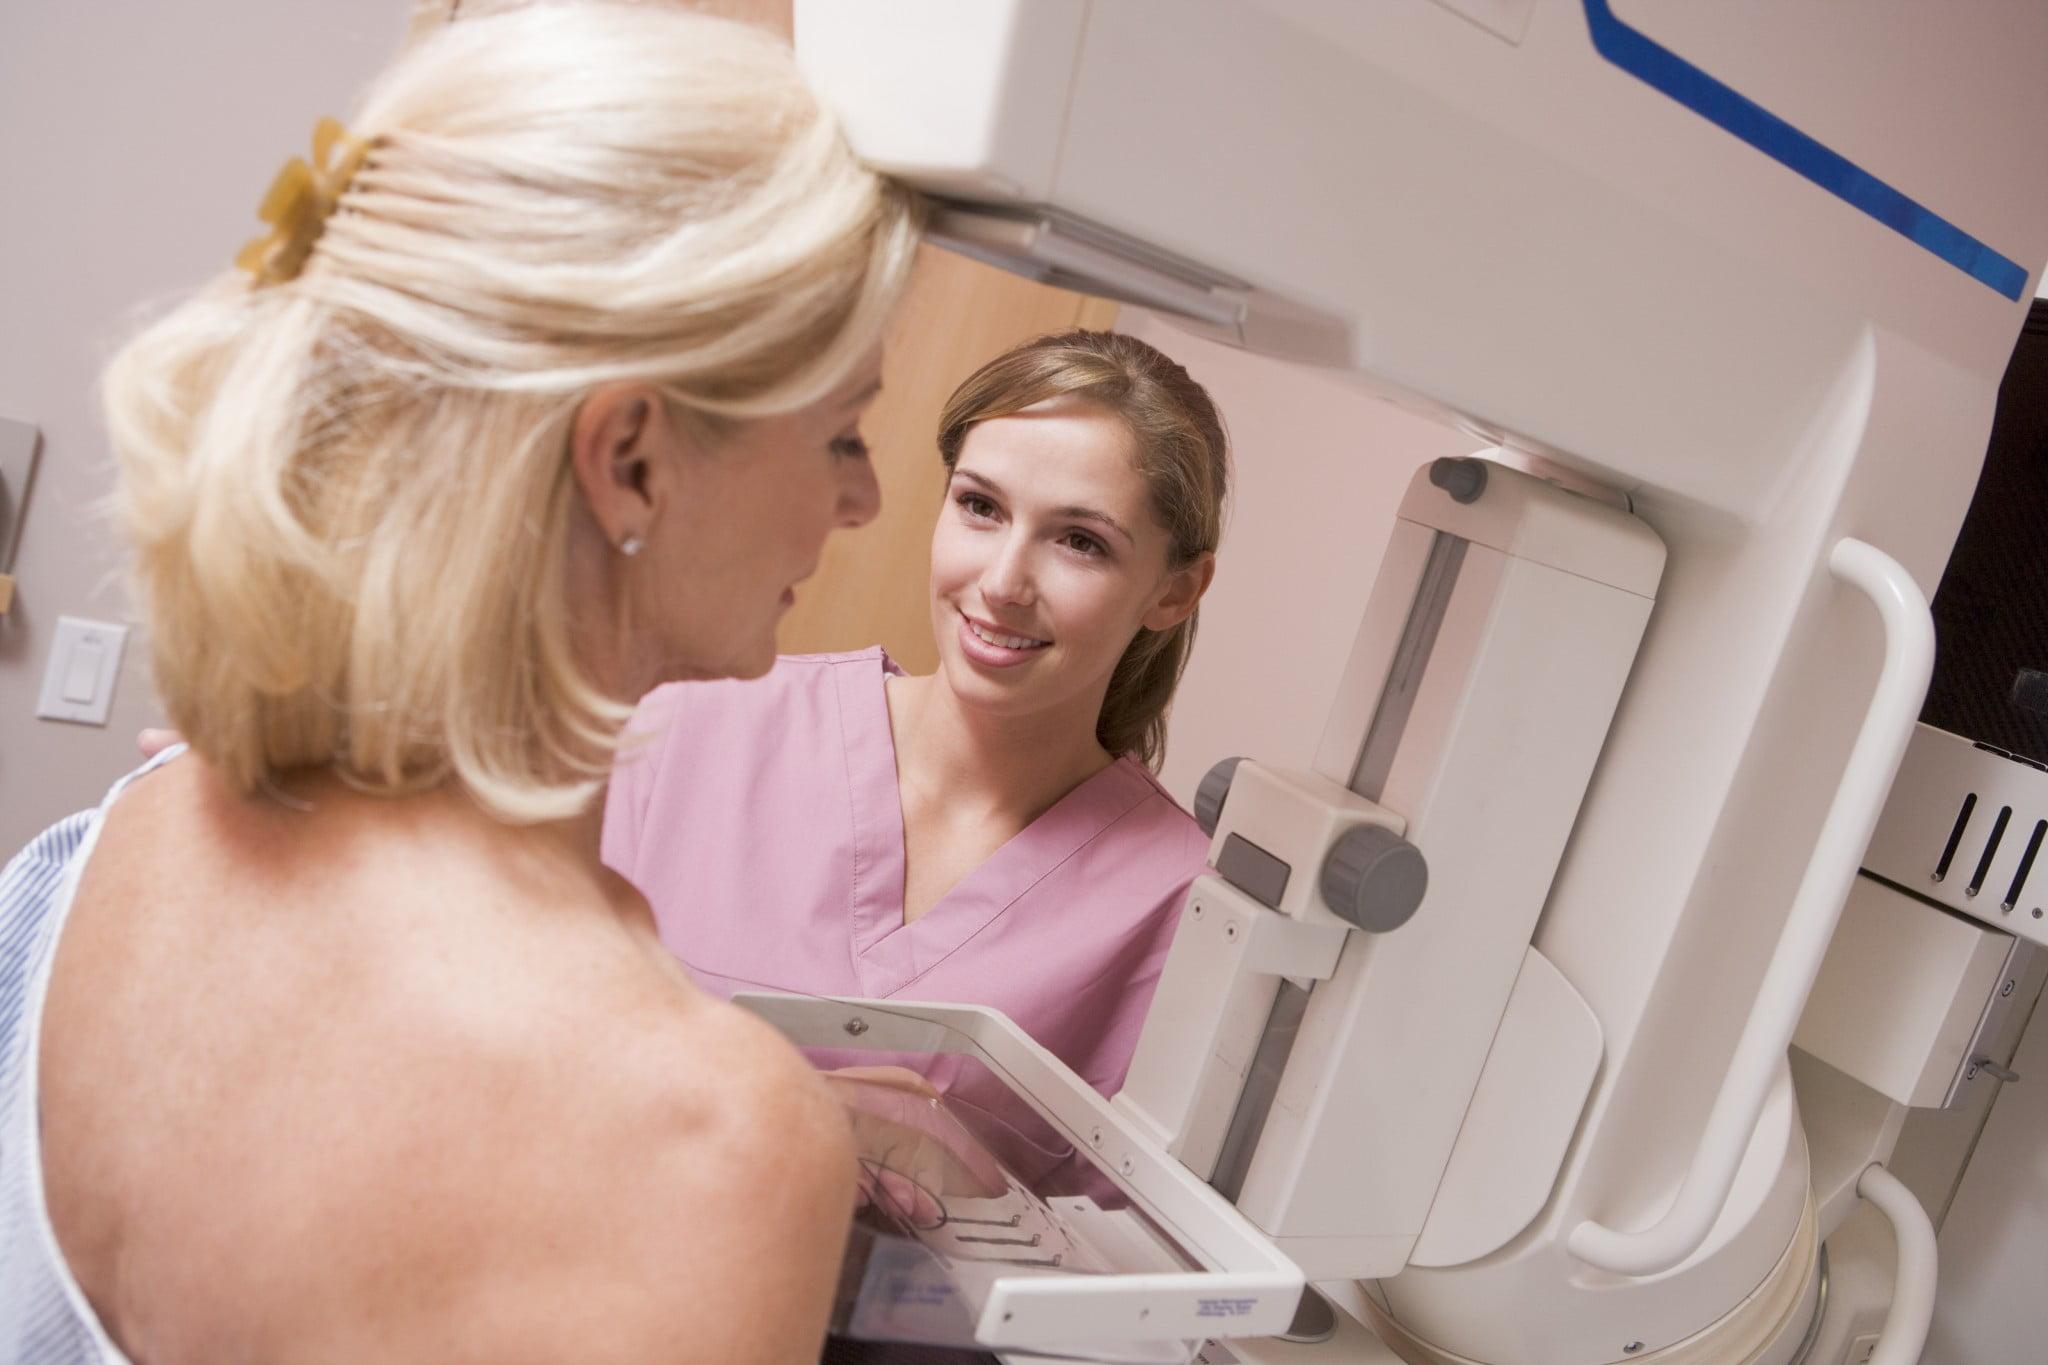 breastscreen: woman having mammogram